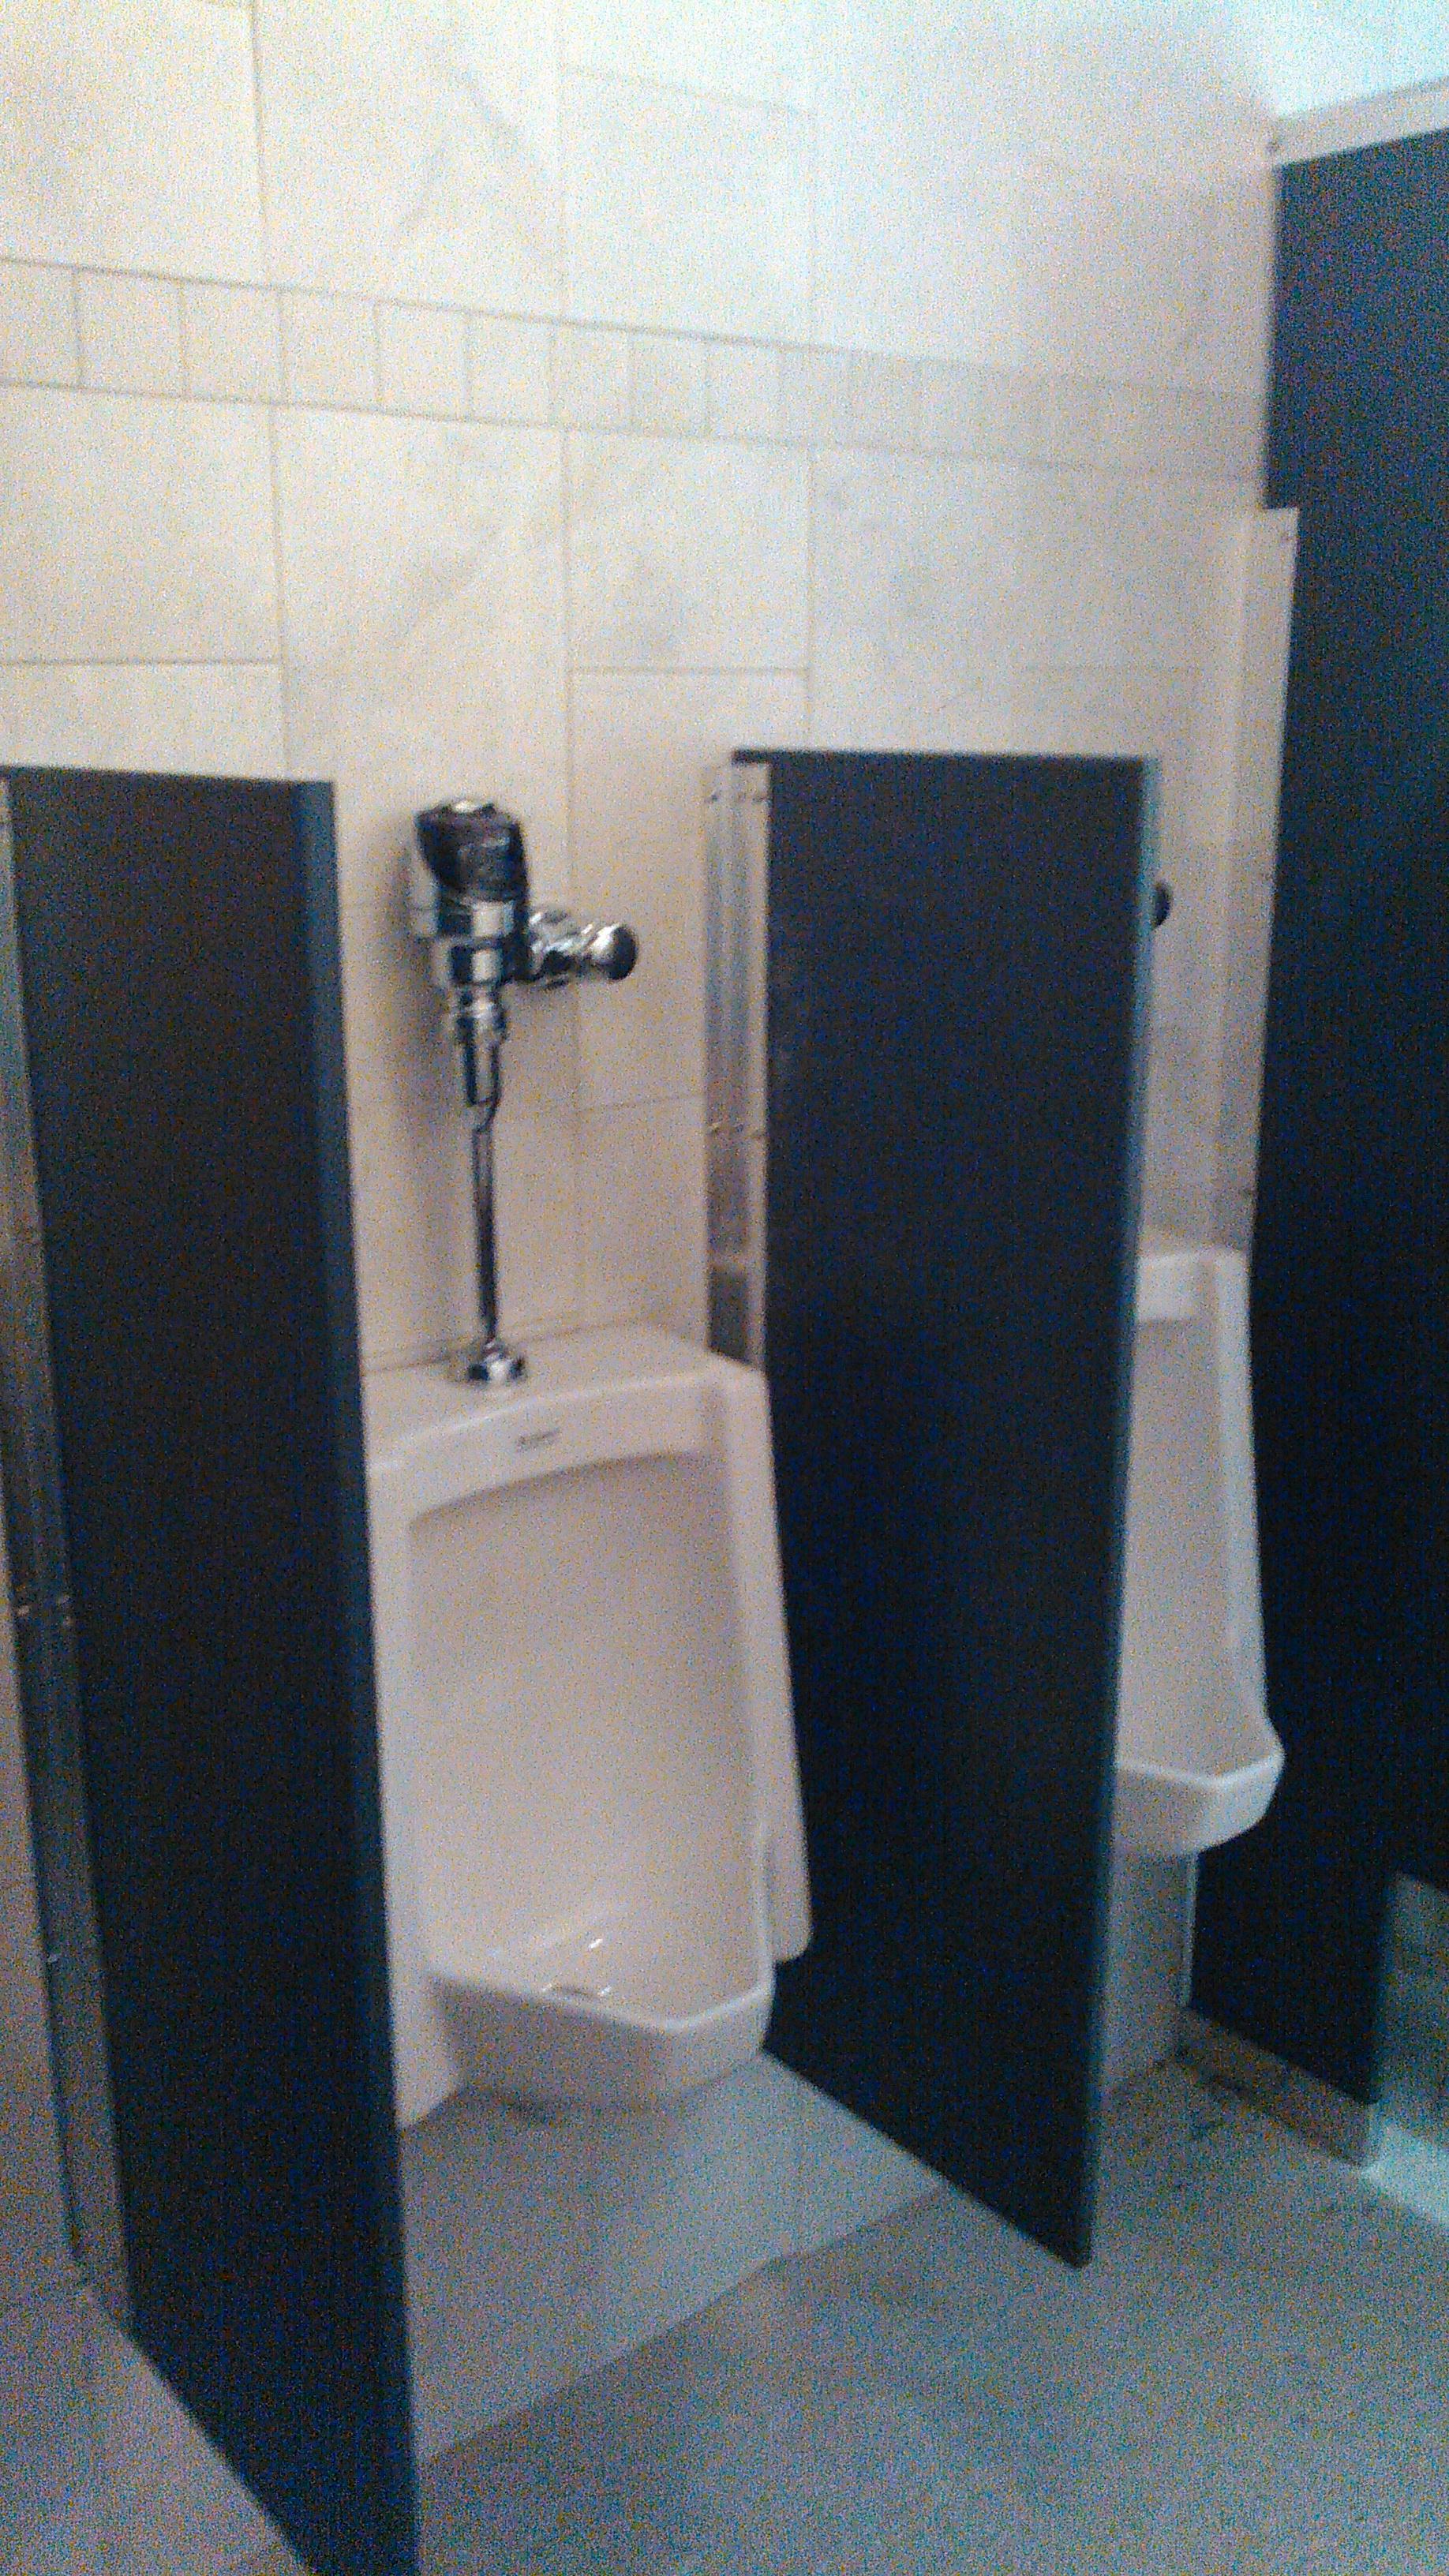 Disabled Bathroom Floor Coverings : Church progress galbraith pre design